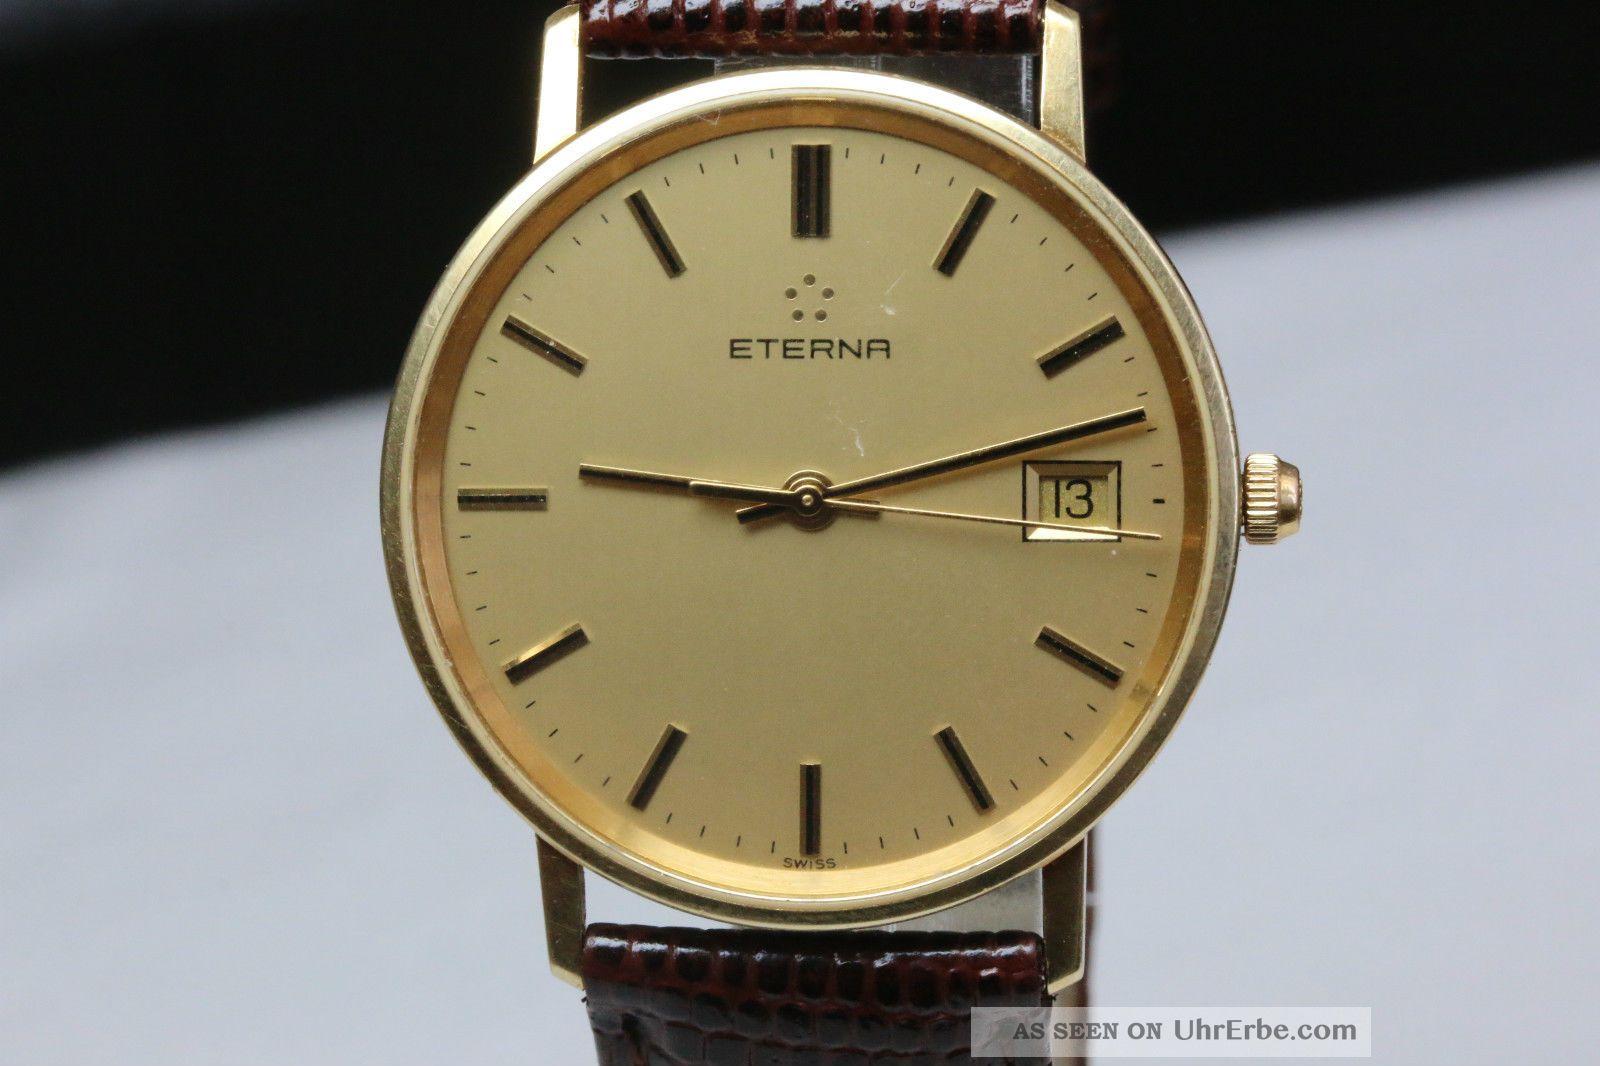 Eterna Armbanduhr 18k,  Ohne Box,  750gg Avs2743 Dif Rwt1 Armbanduhren Bild